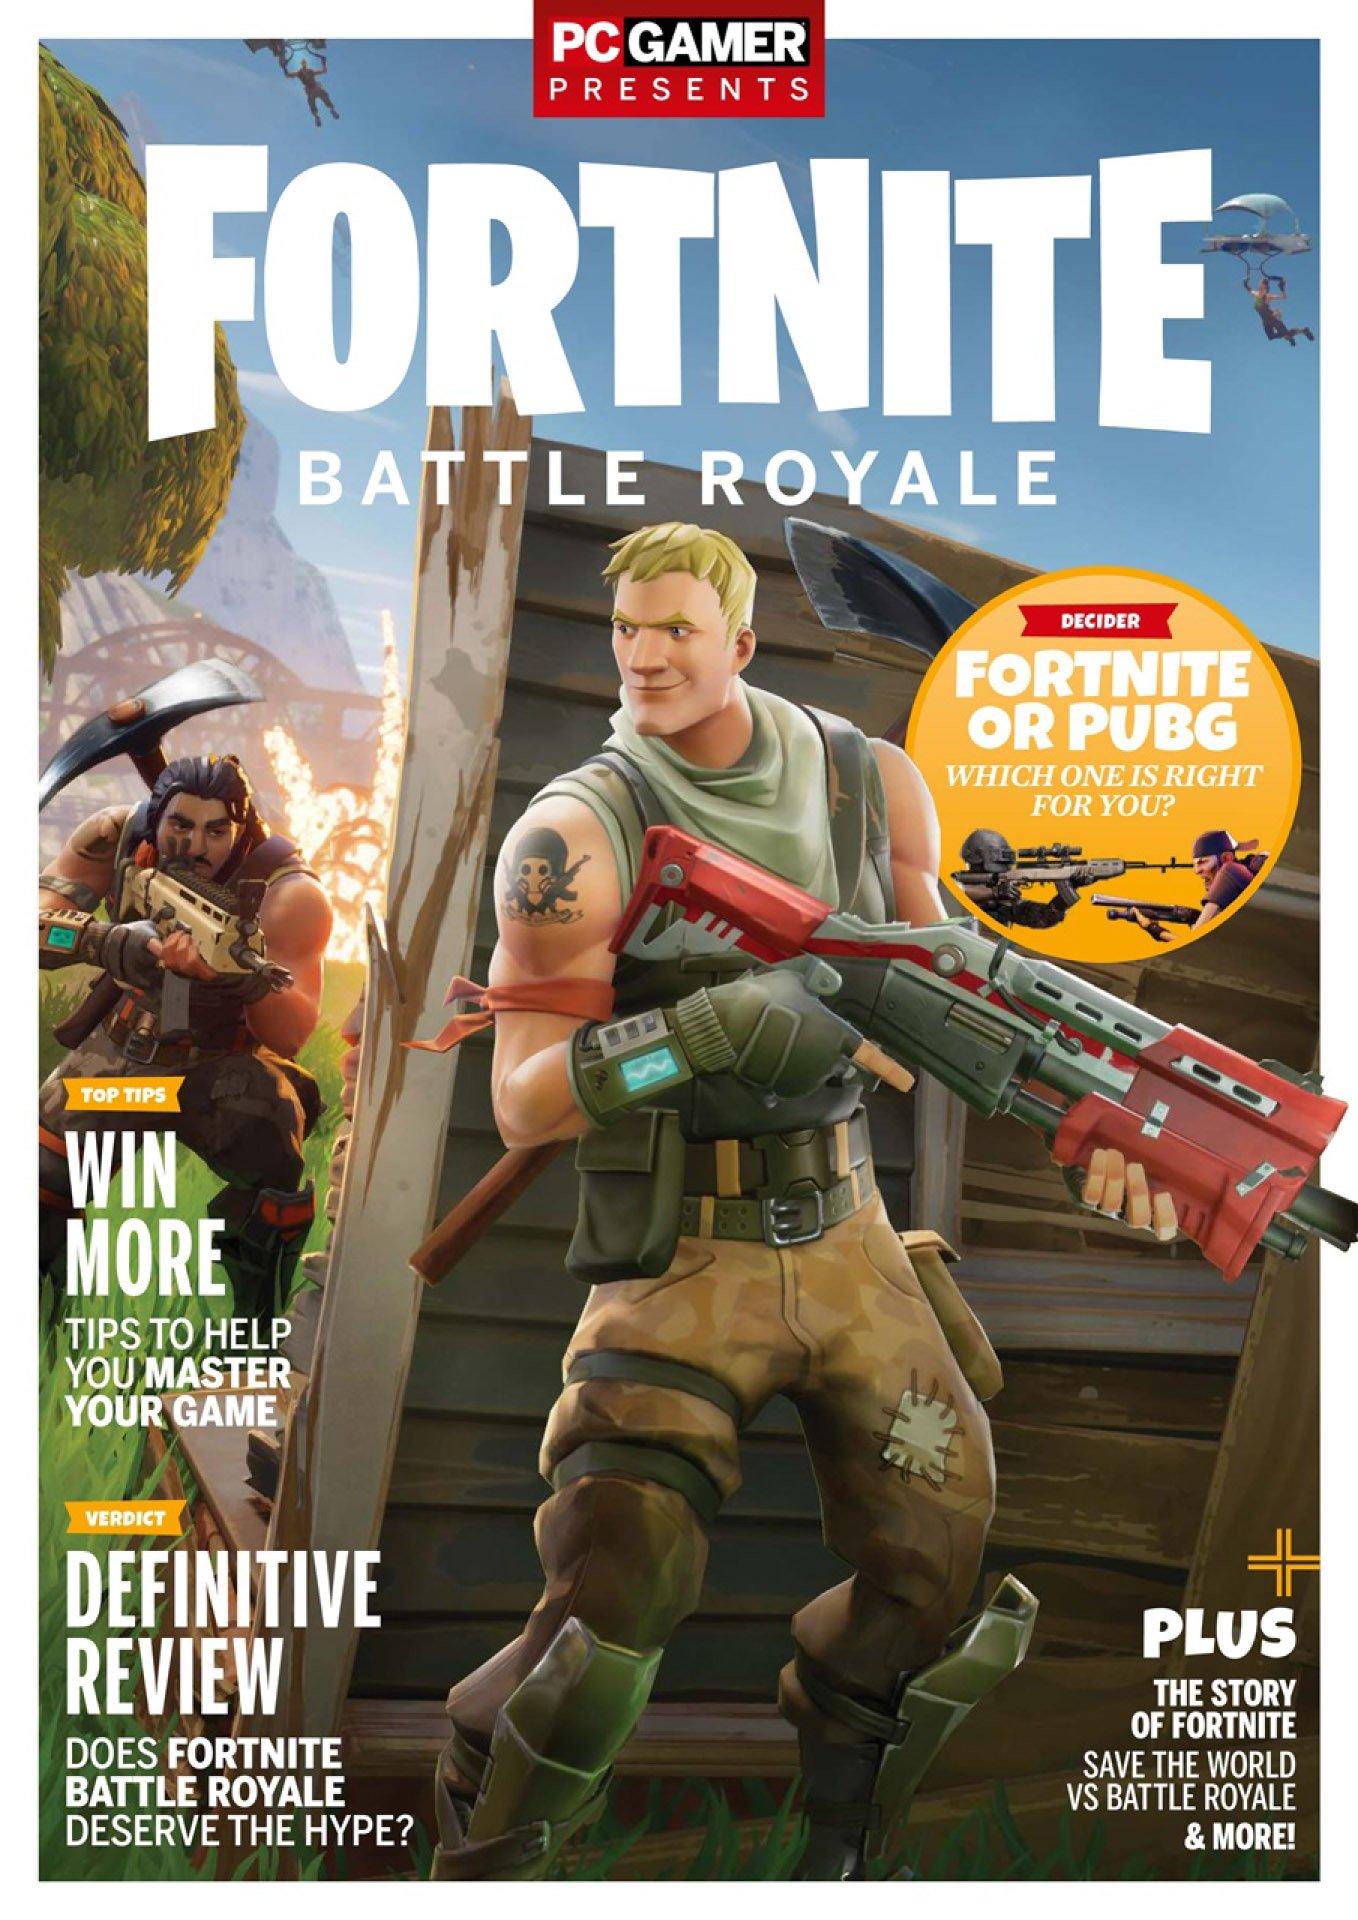 PC Gamer Presents Fortnite Battle Royale